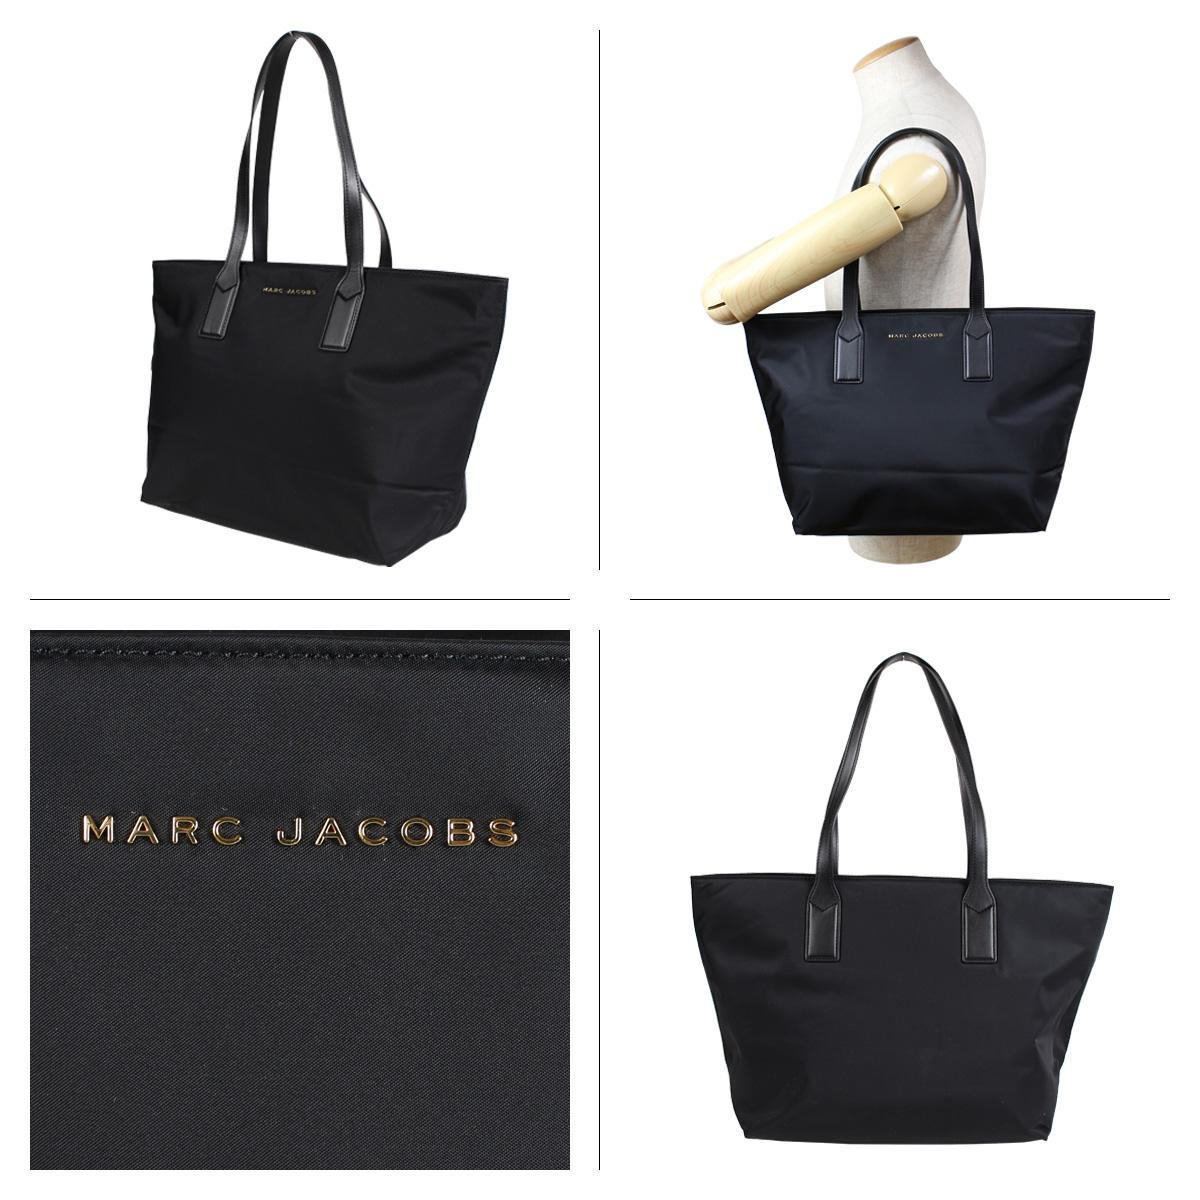 fd3fe5ec4315 MARC JACOBS NYLON WINGMAN TOTE BAG mark Jacobs bag tote bag Lady s black  M0013561  1 8 Shinnyu load   1901